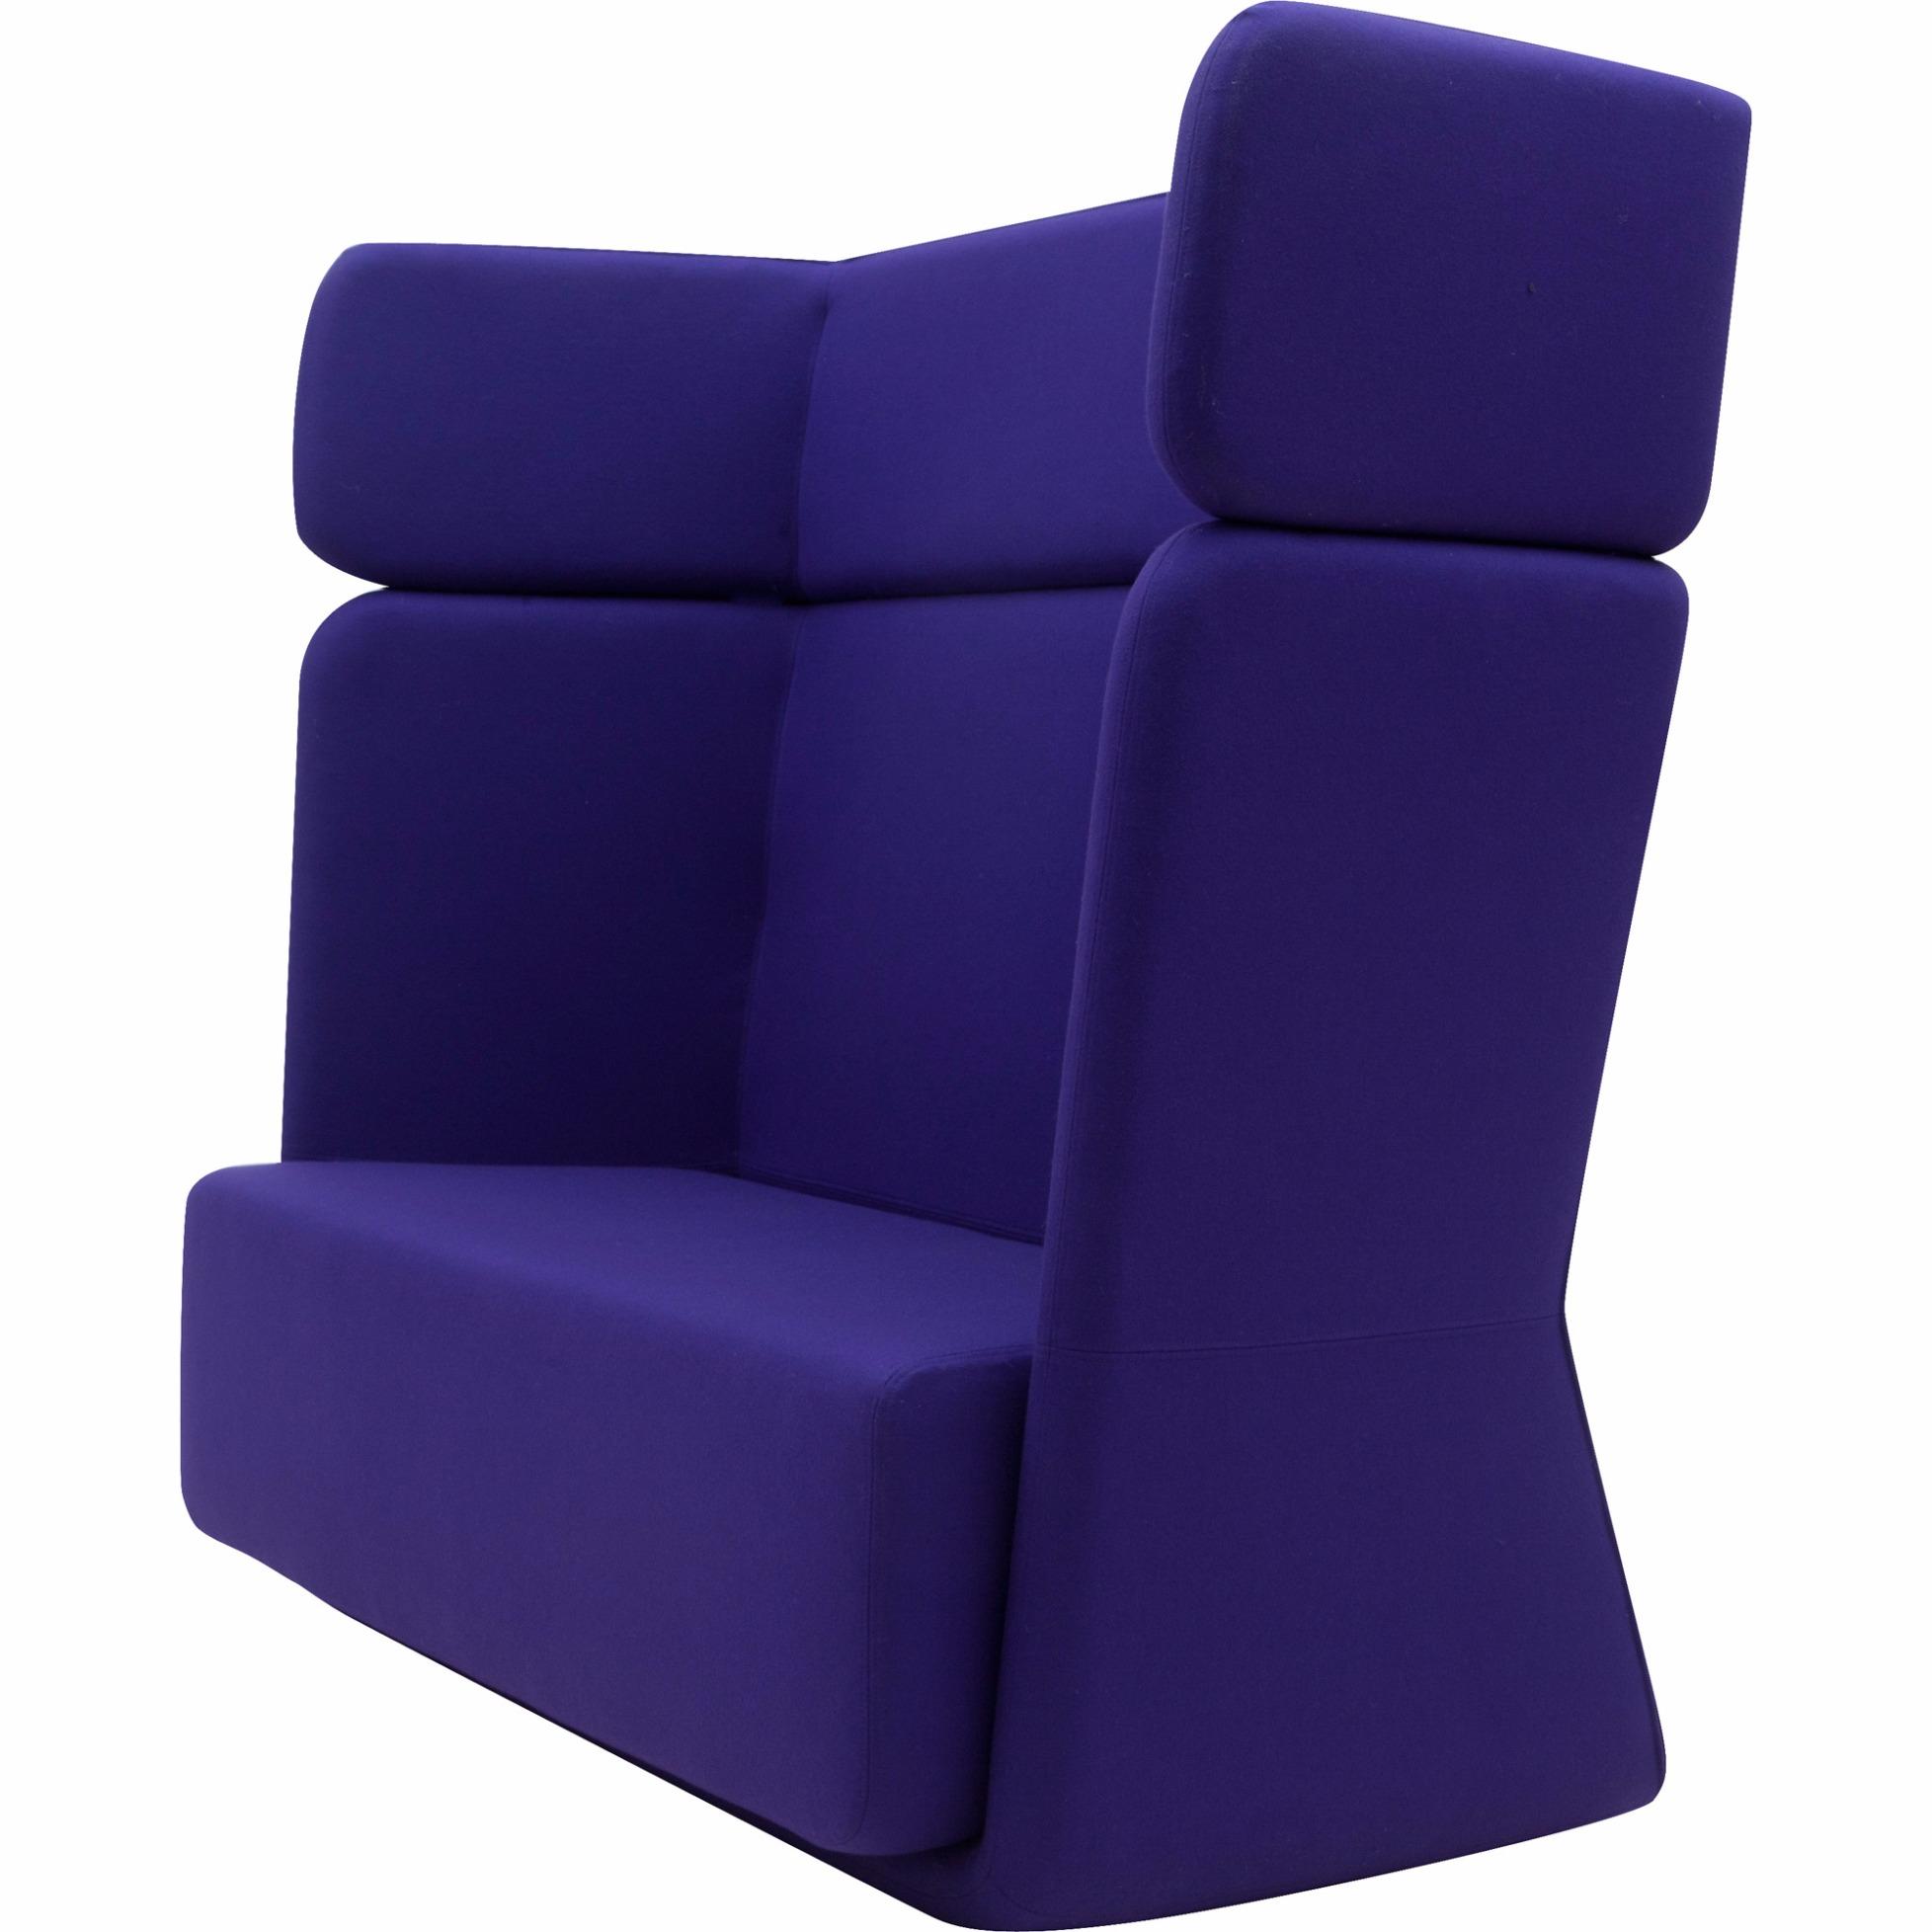 Sessel sofa hoch von softline for Sessel schmal hoch